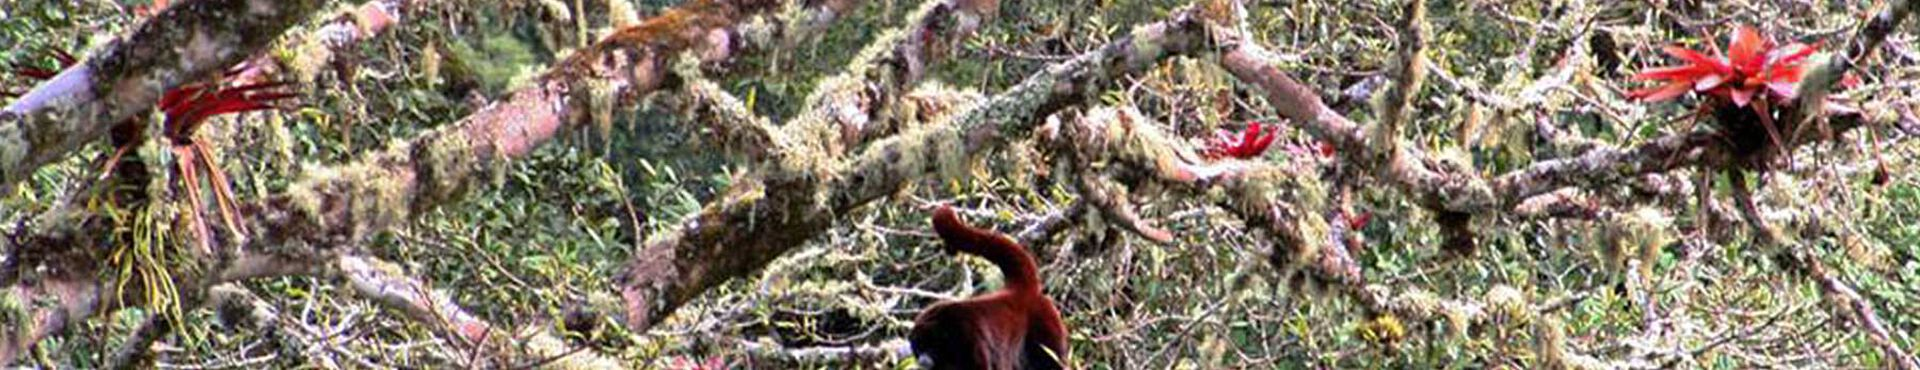 Banner - Neotropical Primate Conservation Peru